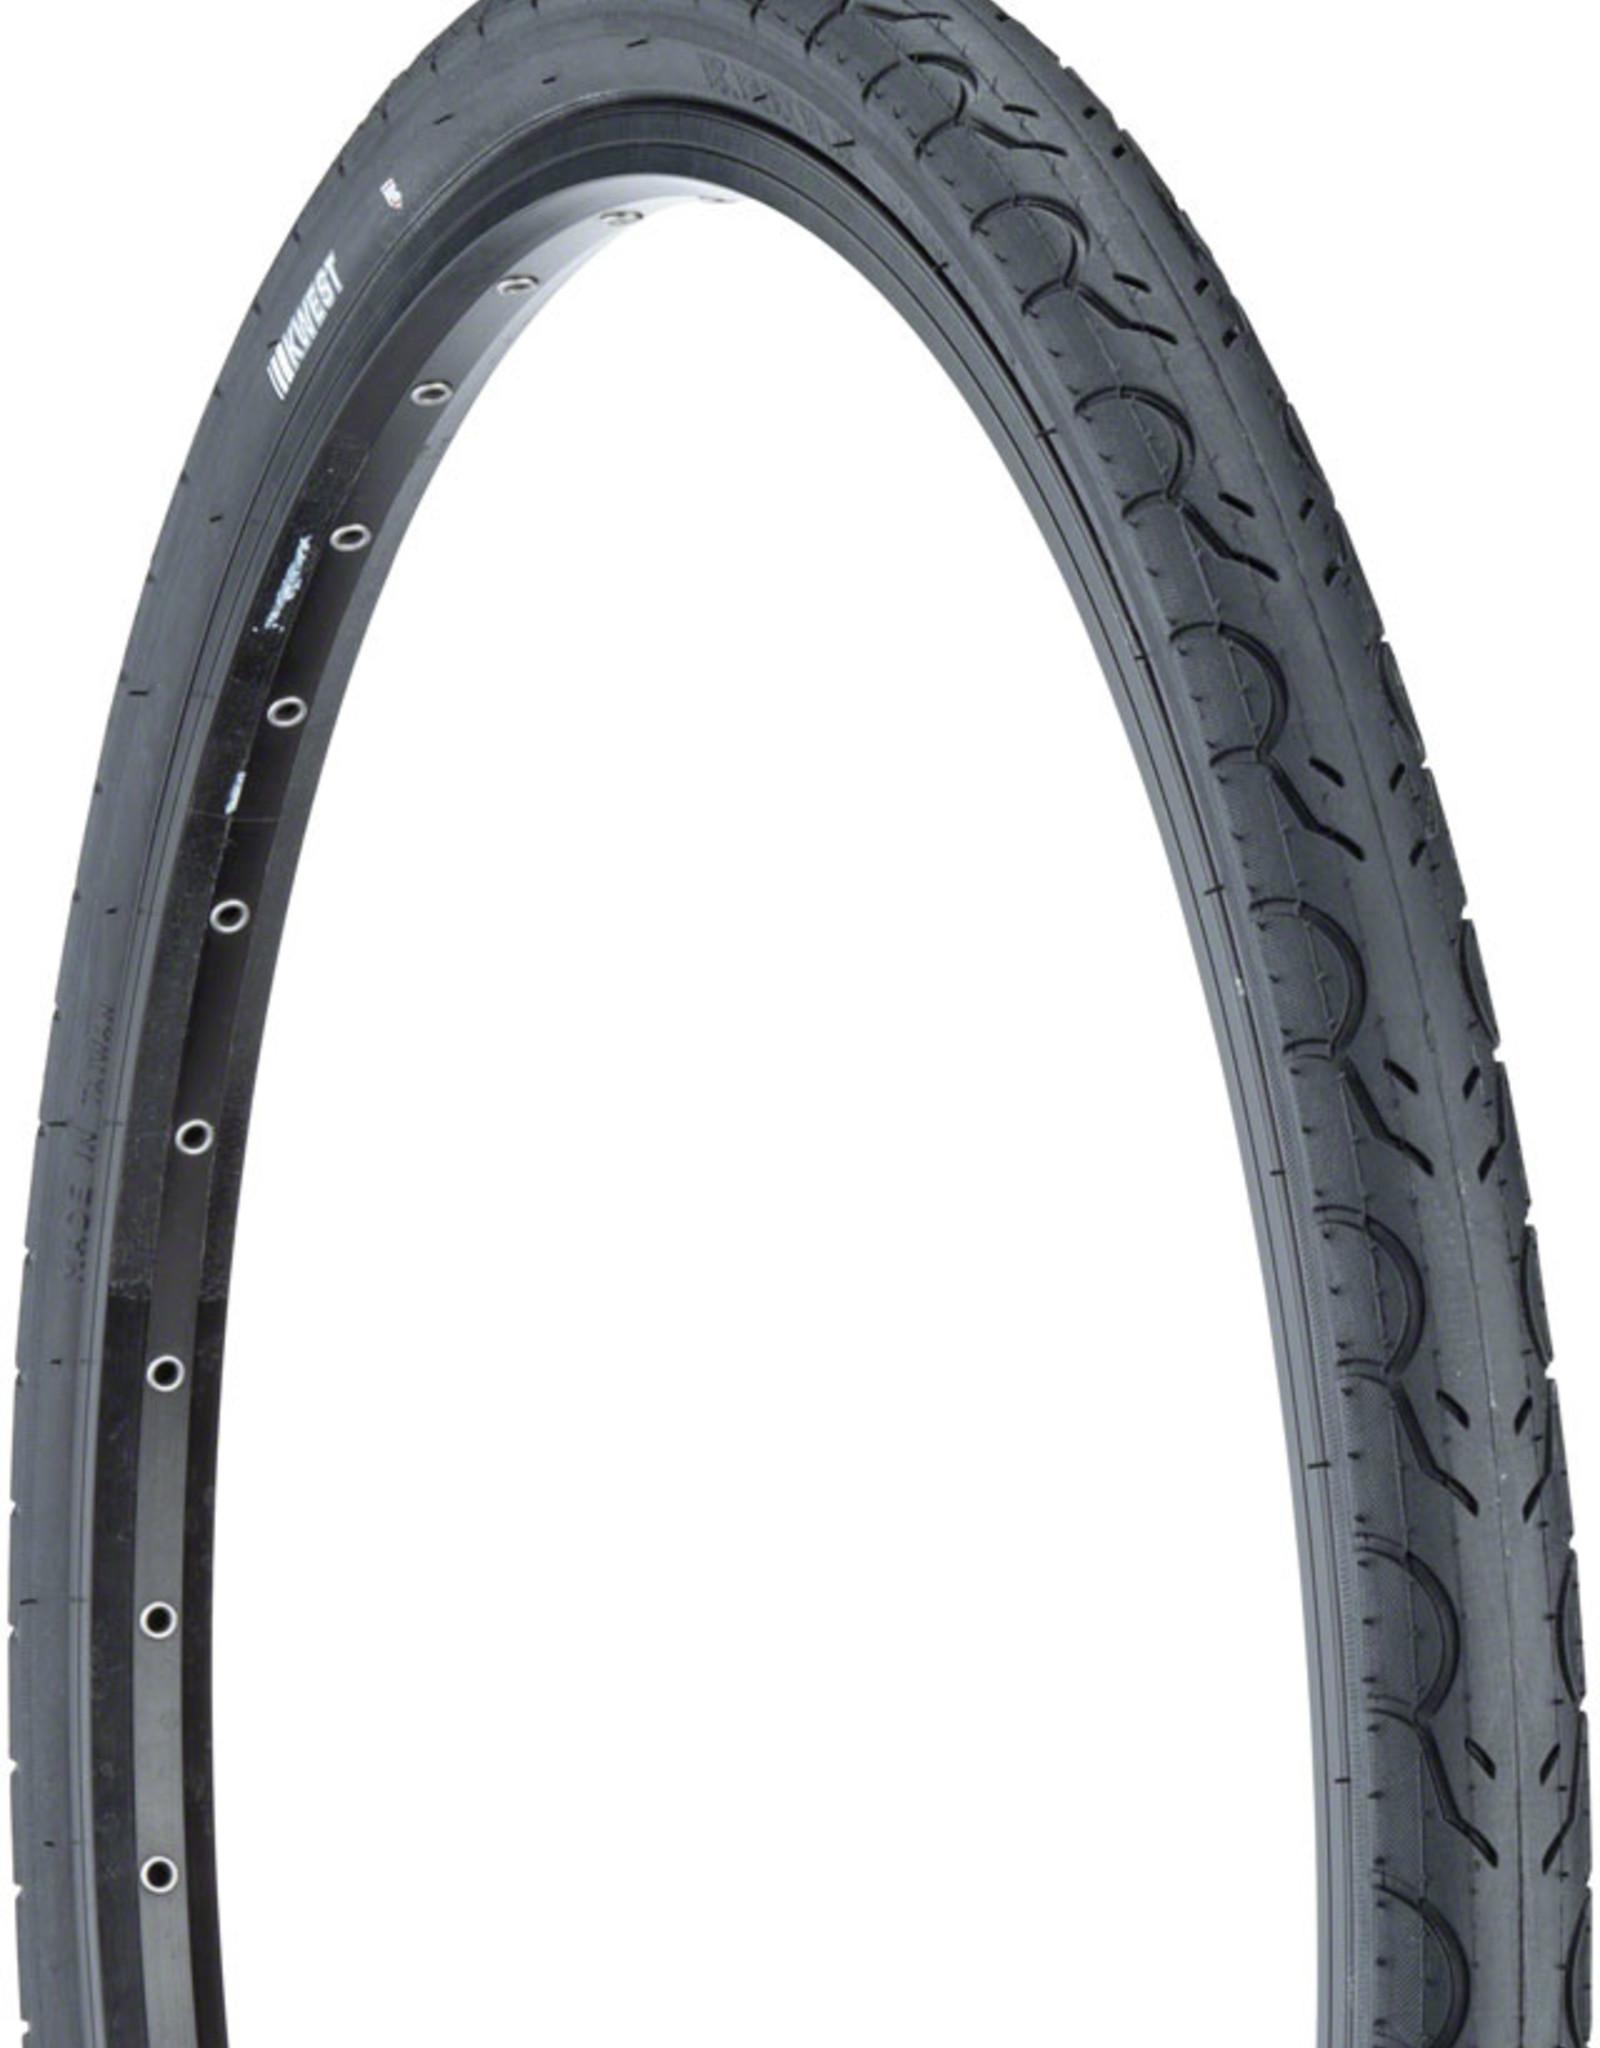 Kenda Kwest High Pressure Tire - 20 x 1.5, Clincher, Wire, Black, 60tpi